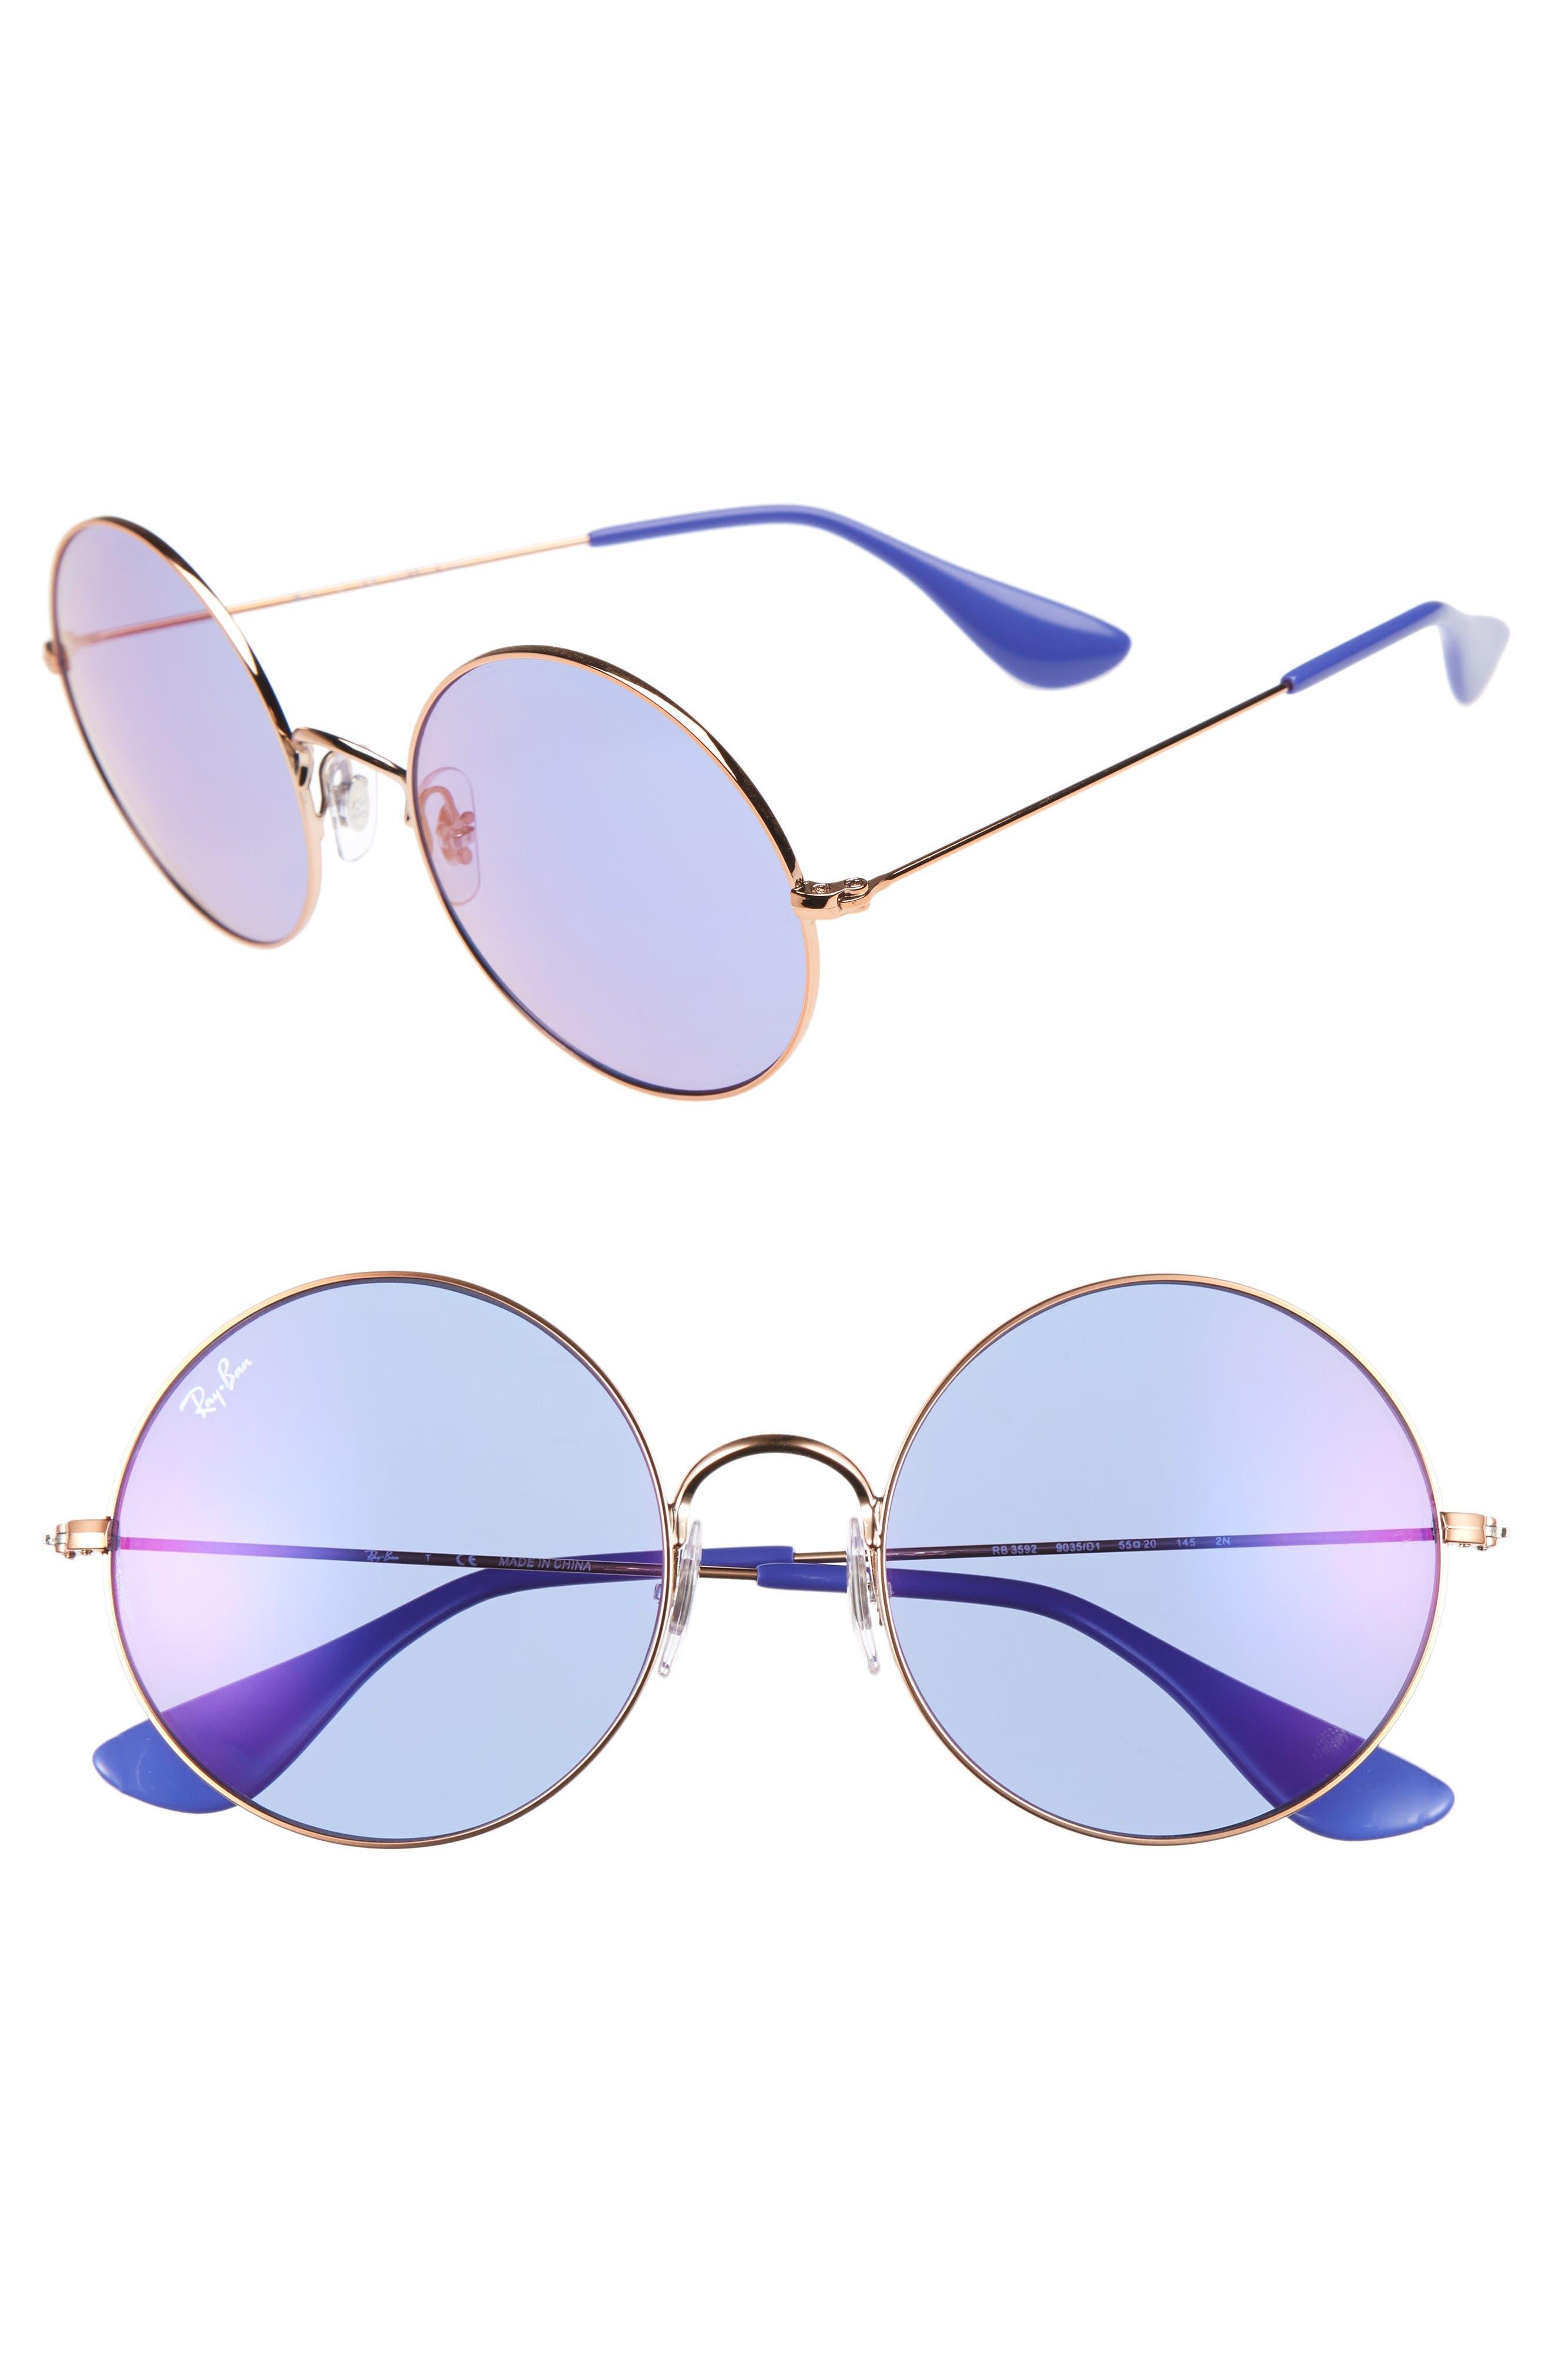 Ray-Ban The Ja-Jo 54mm Round Sunglasses